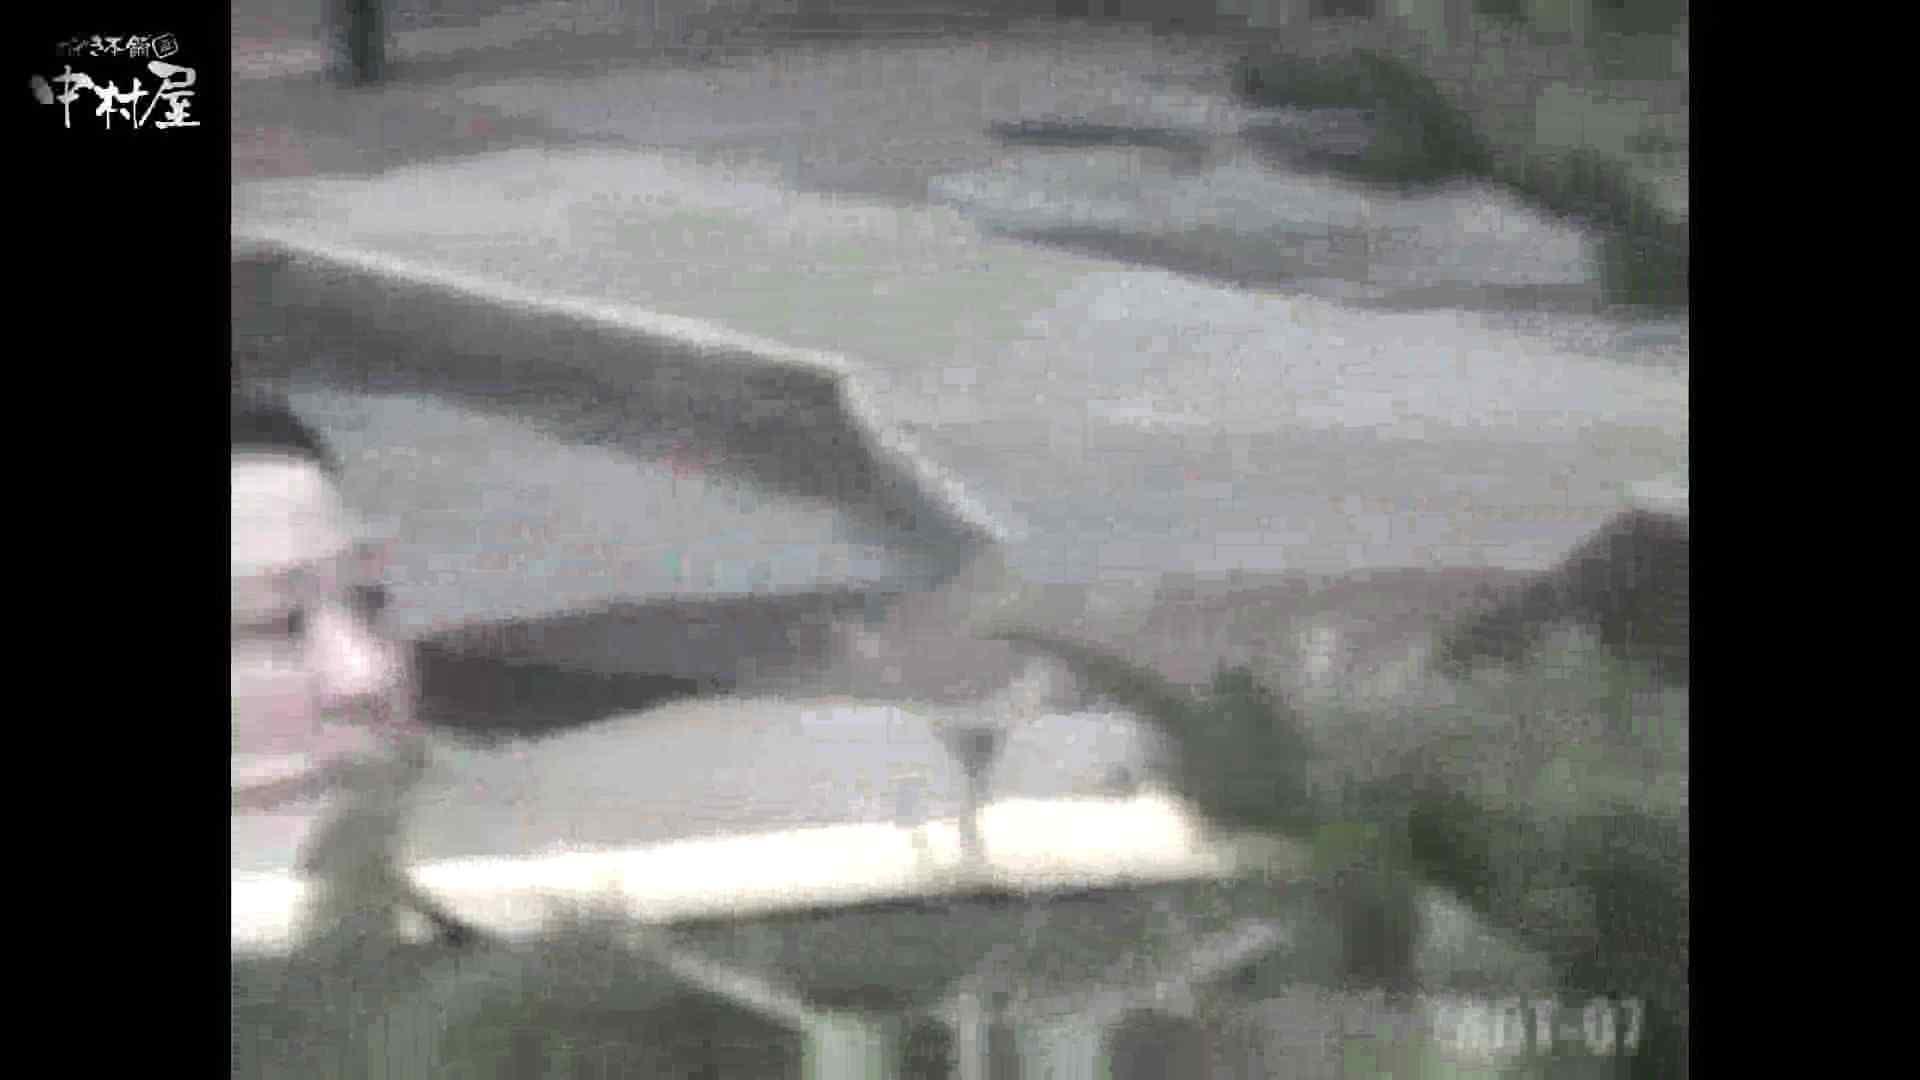 Aquaな露天風呂Vol.871潜入盗撮露天風呂七判湯 其の三 盗撮特集   露天  105画像 45